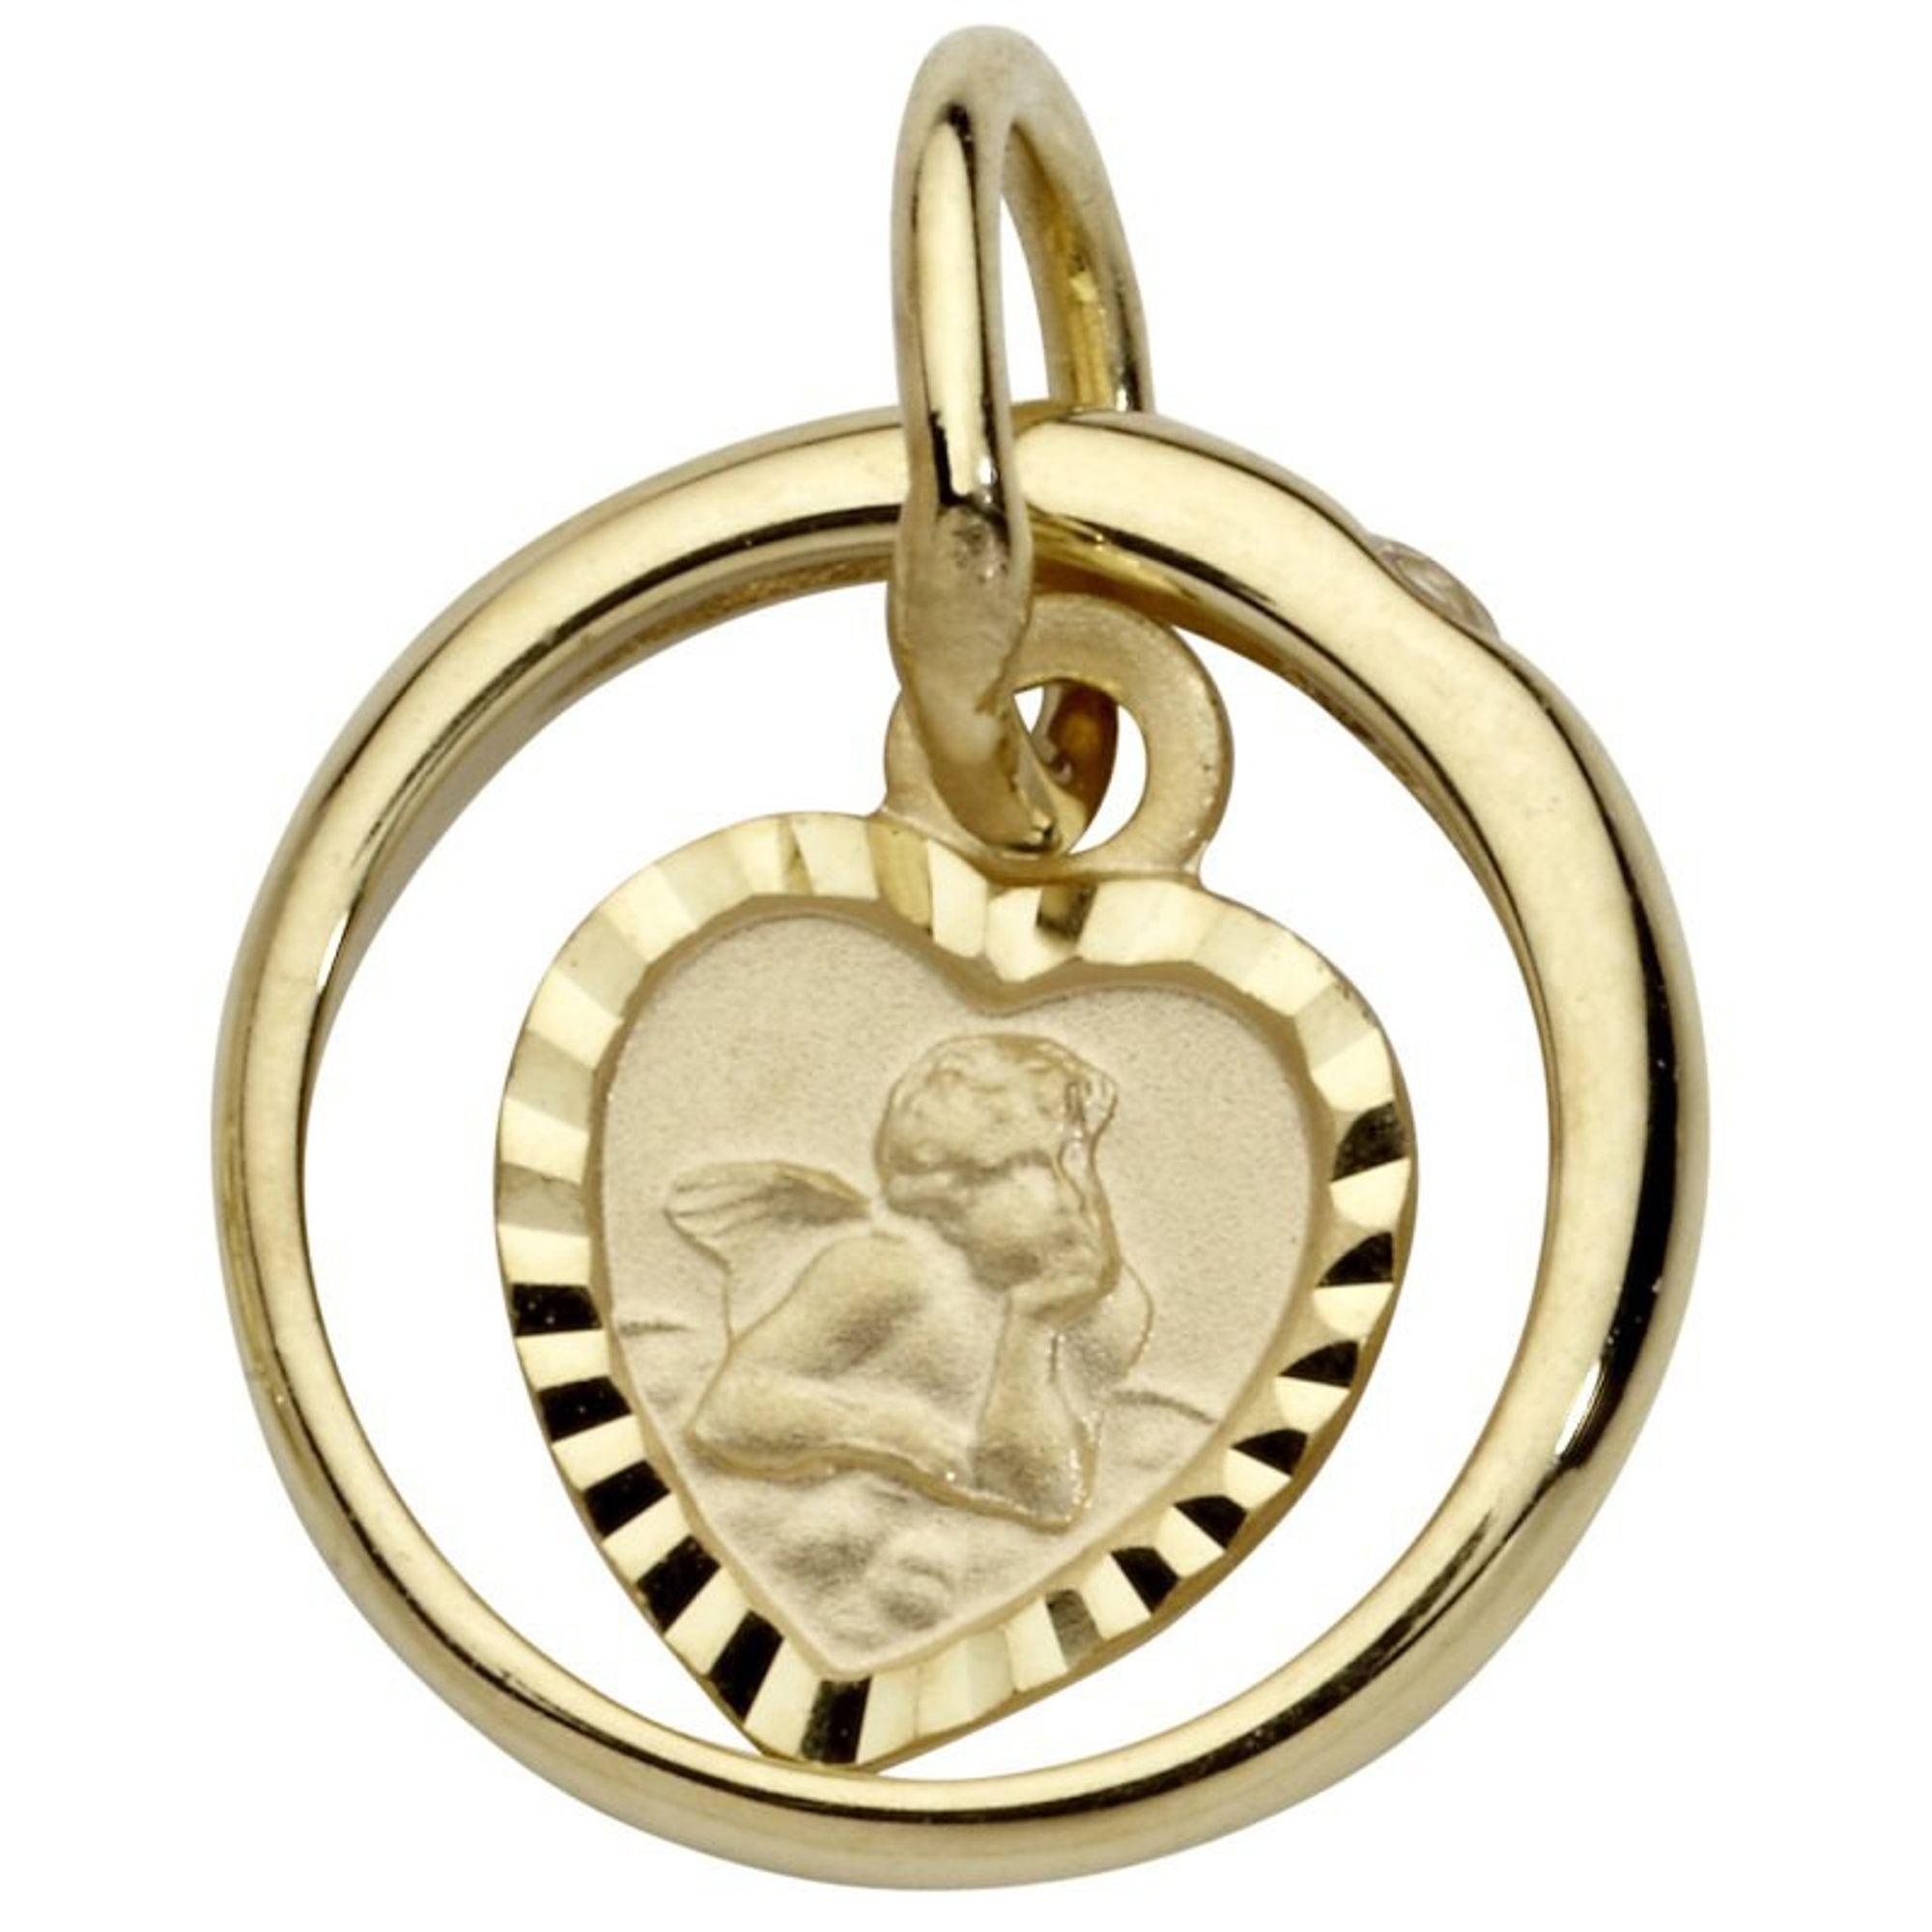 Basic Gold TG18 Kinder Anhänger Taufring mit Engel 14 Karat (585) Gold